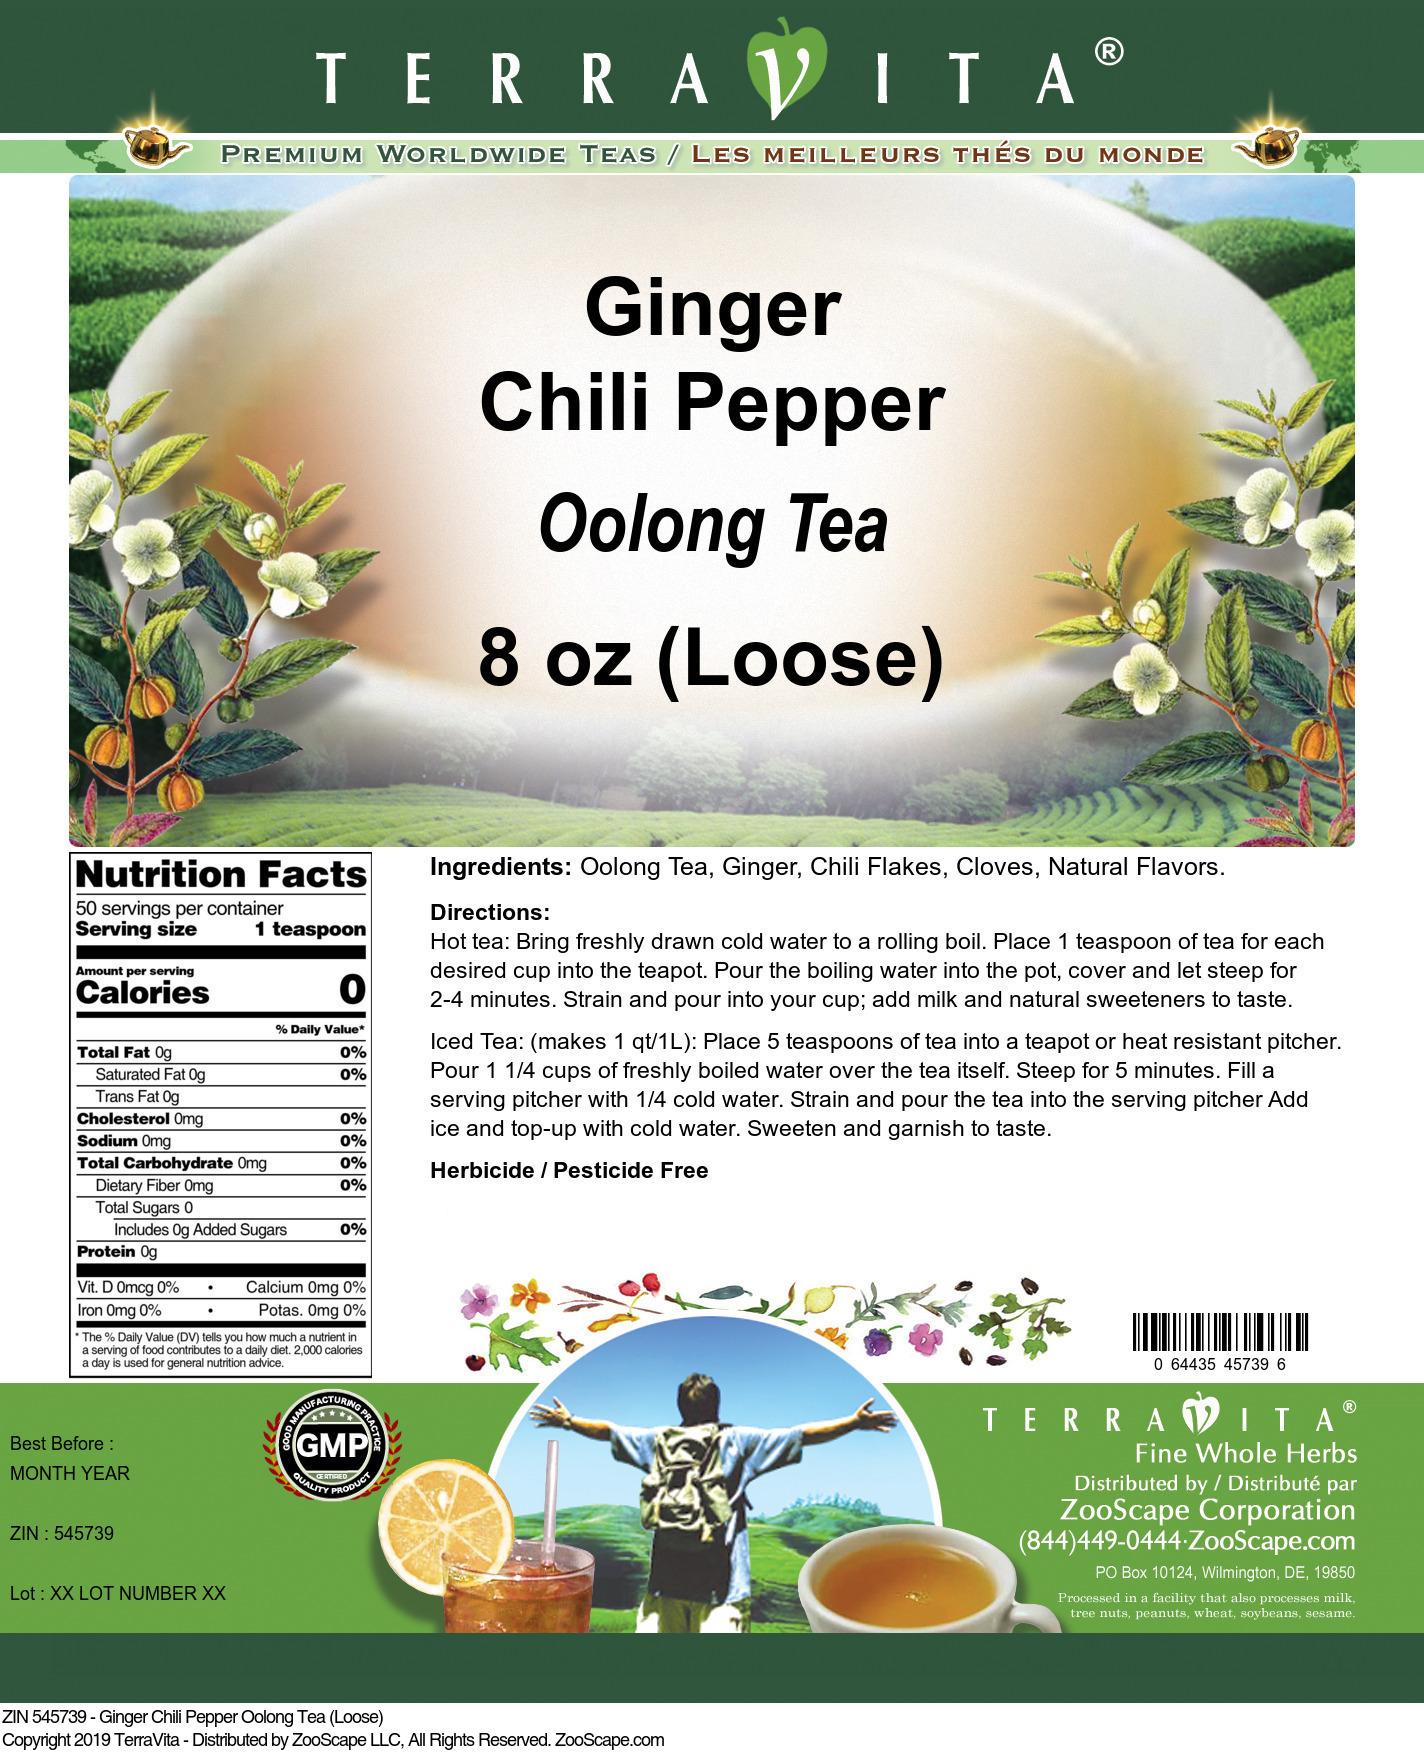 Ginger Chili Pepper Oolong Tea (Loose)